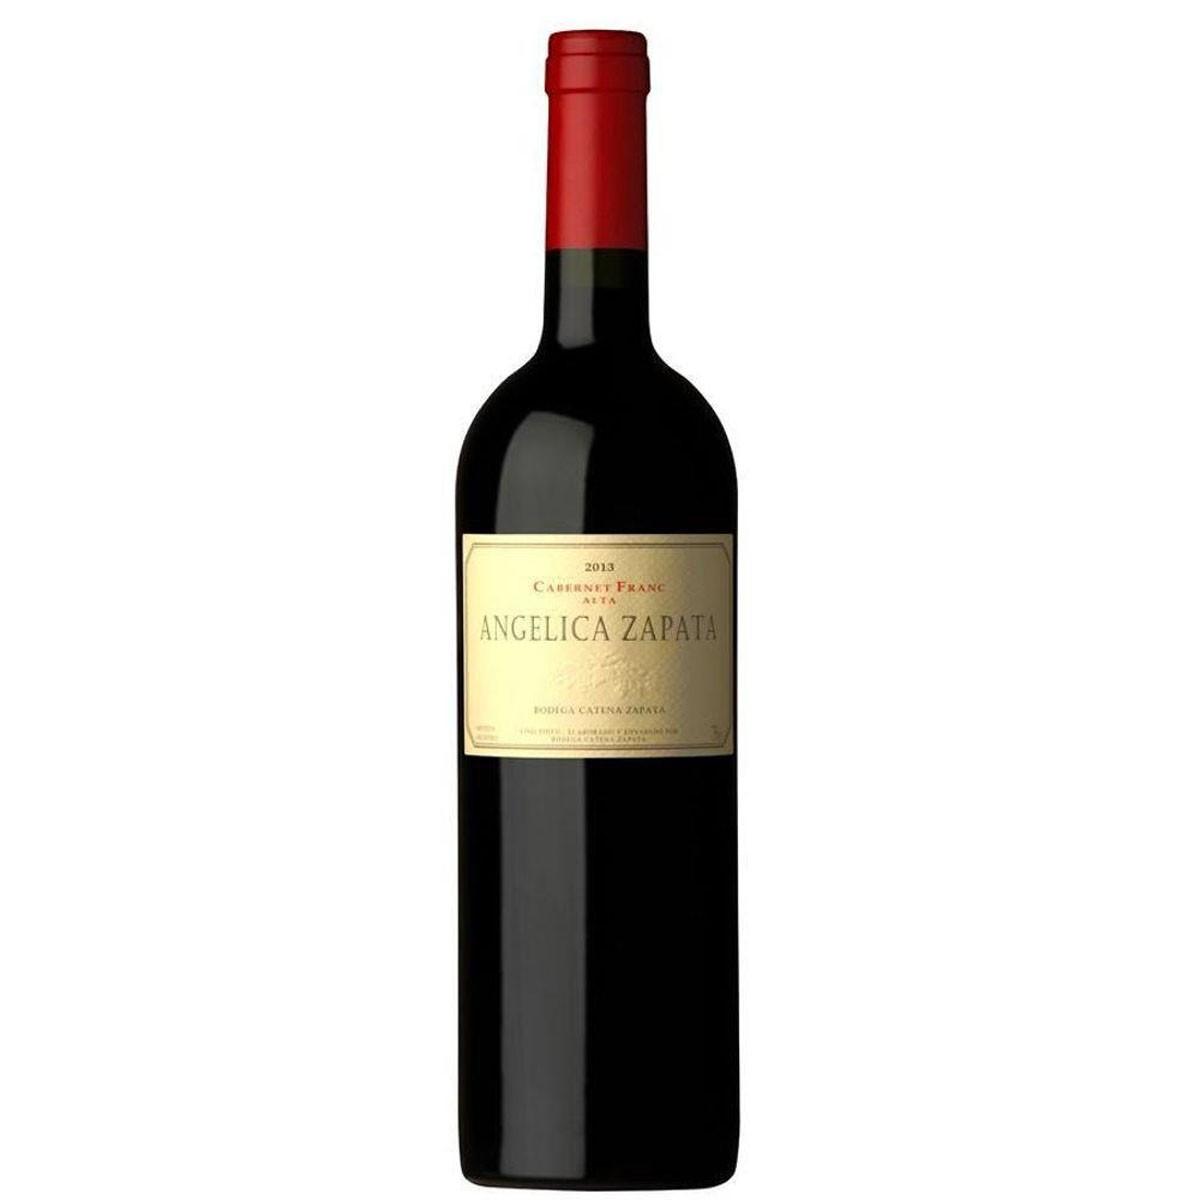 Vinho Tinto Argentino Angelica Zapata Cabernet Franc 2015